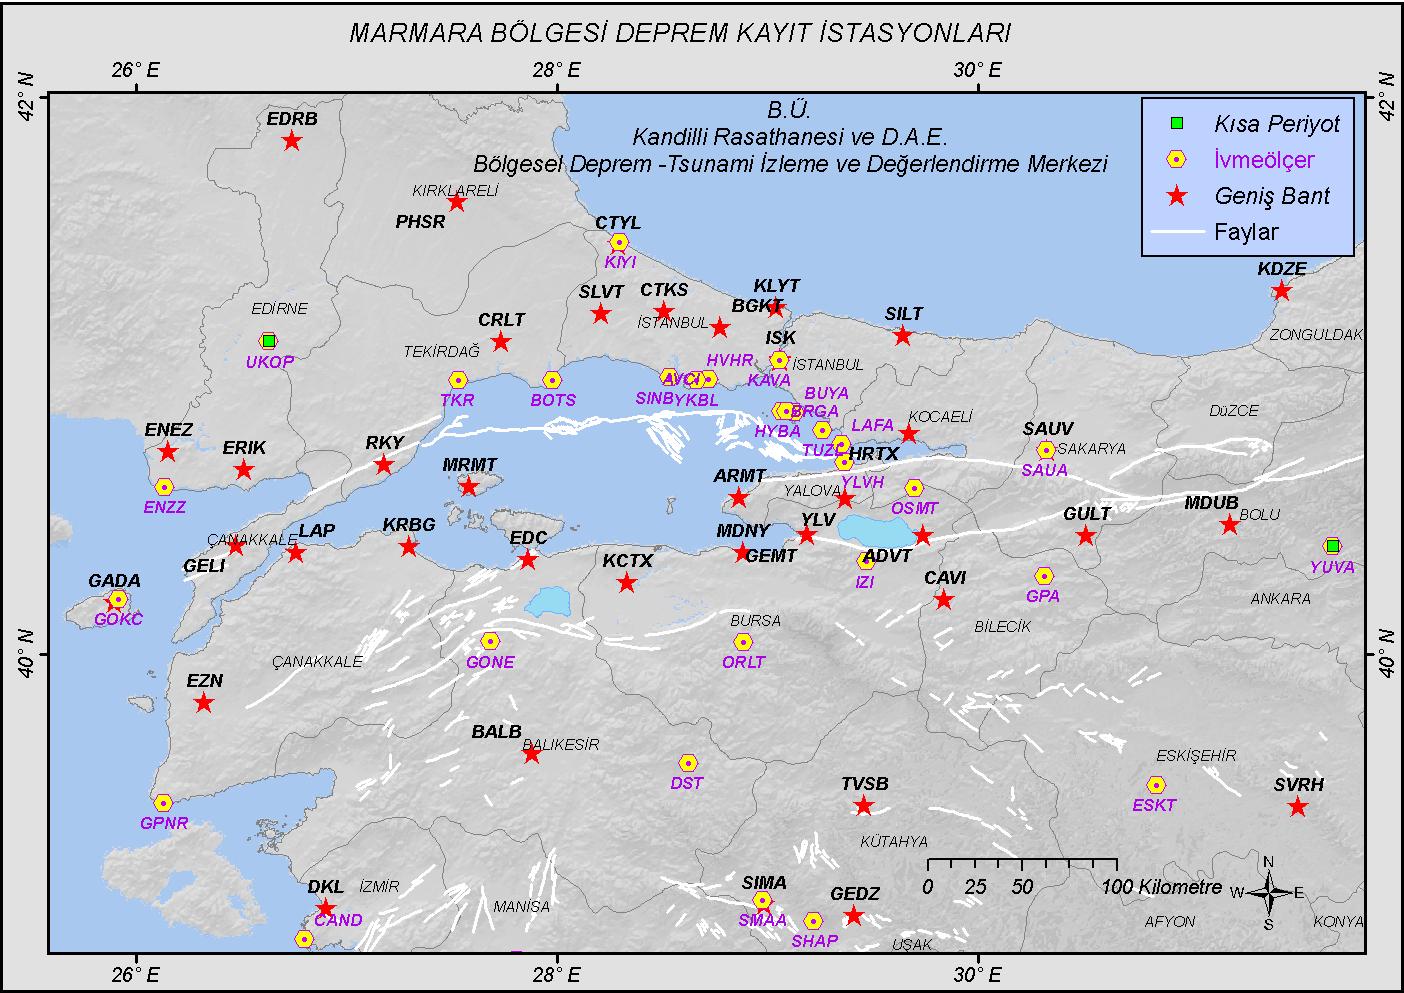 Marmara Bölgesi İstasyonları